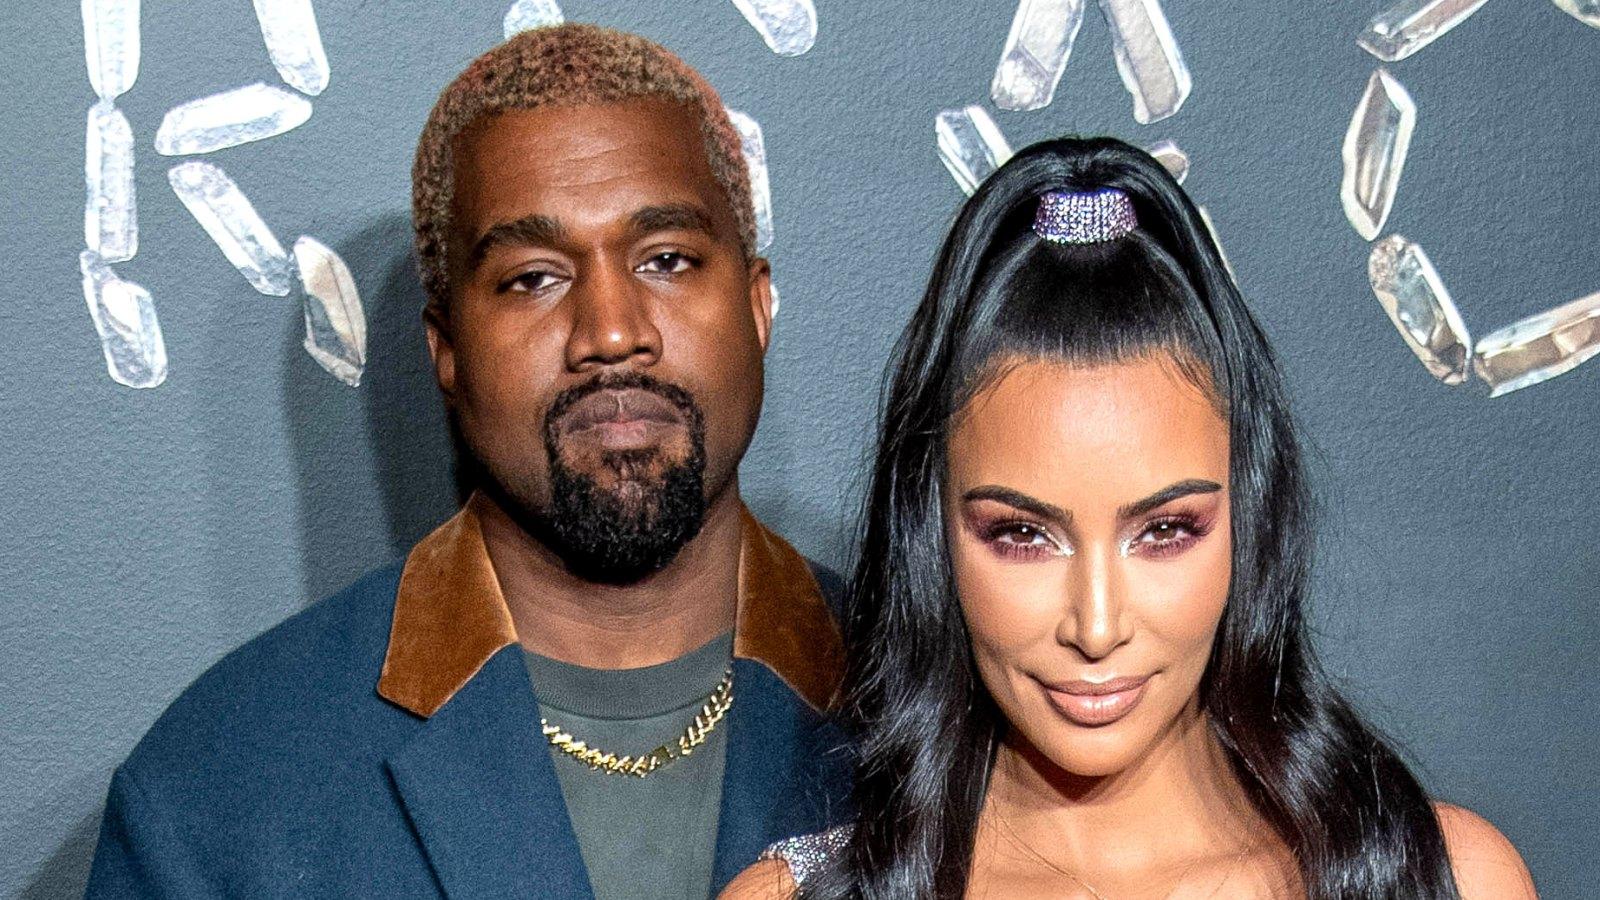 ad9935c95445 Kim Kardashian and Kanye West Welcome Their Fourth Child Via Surrogate